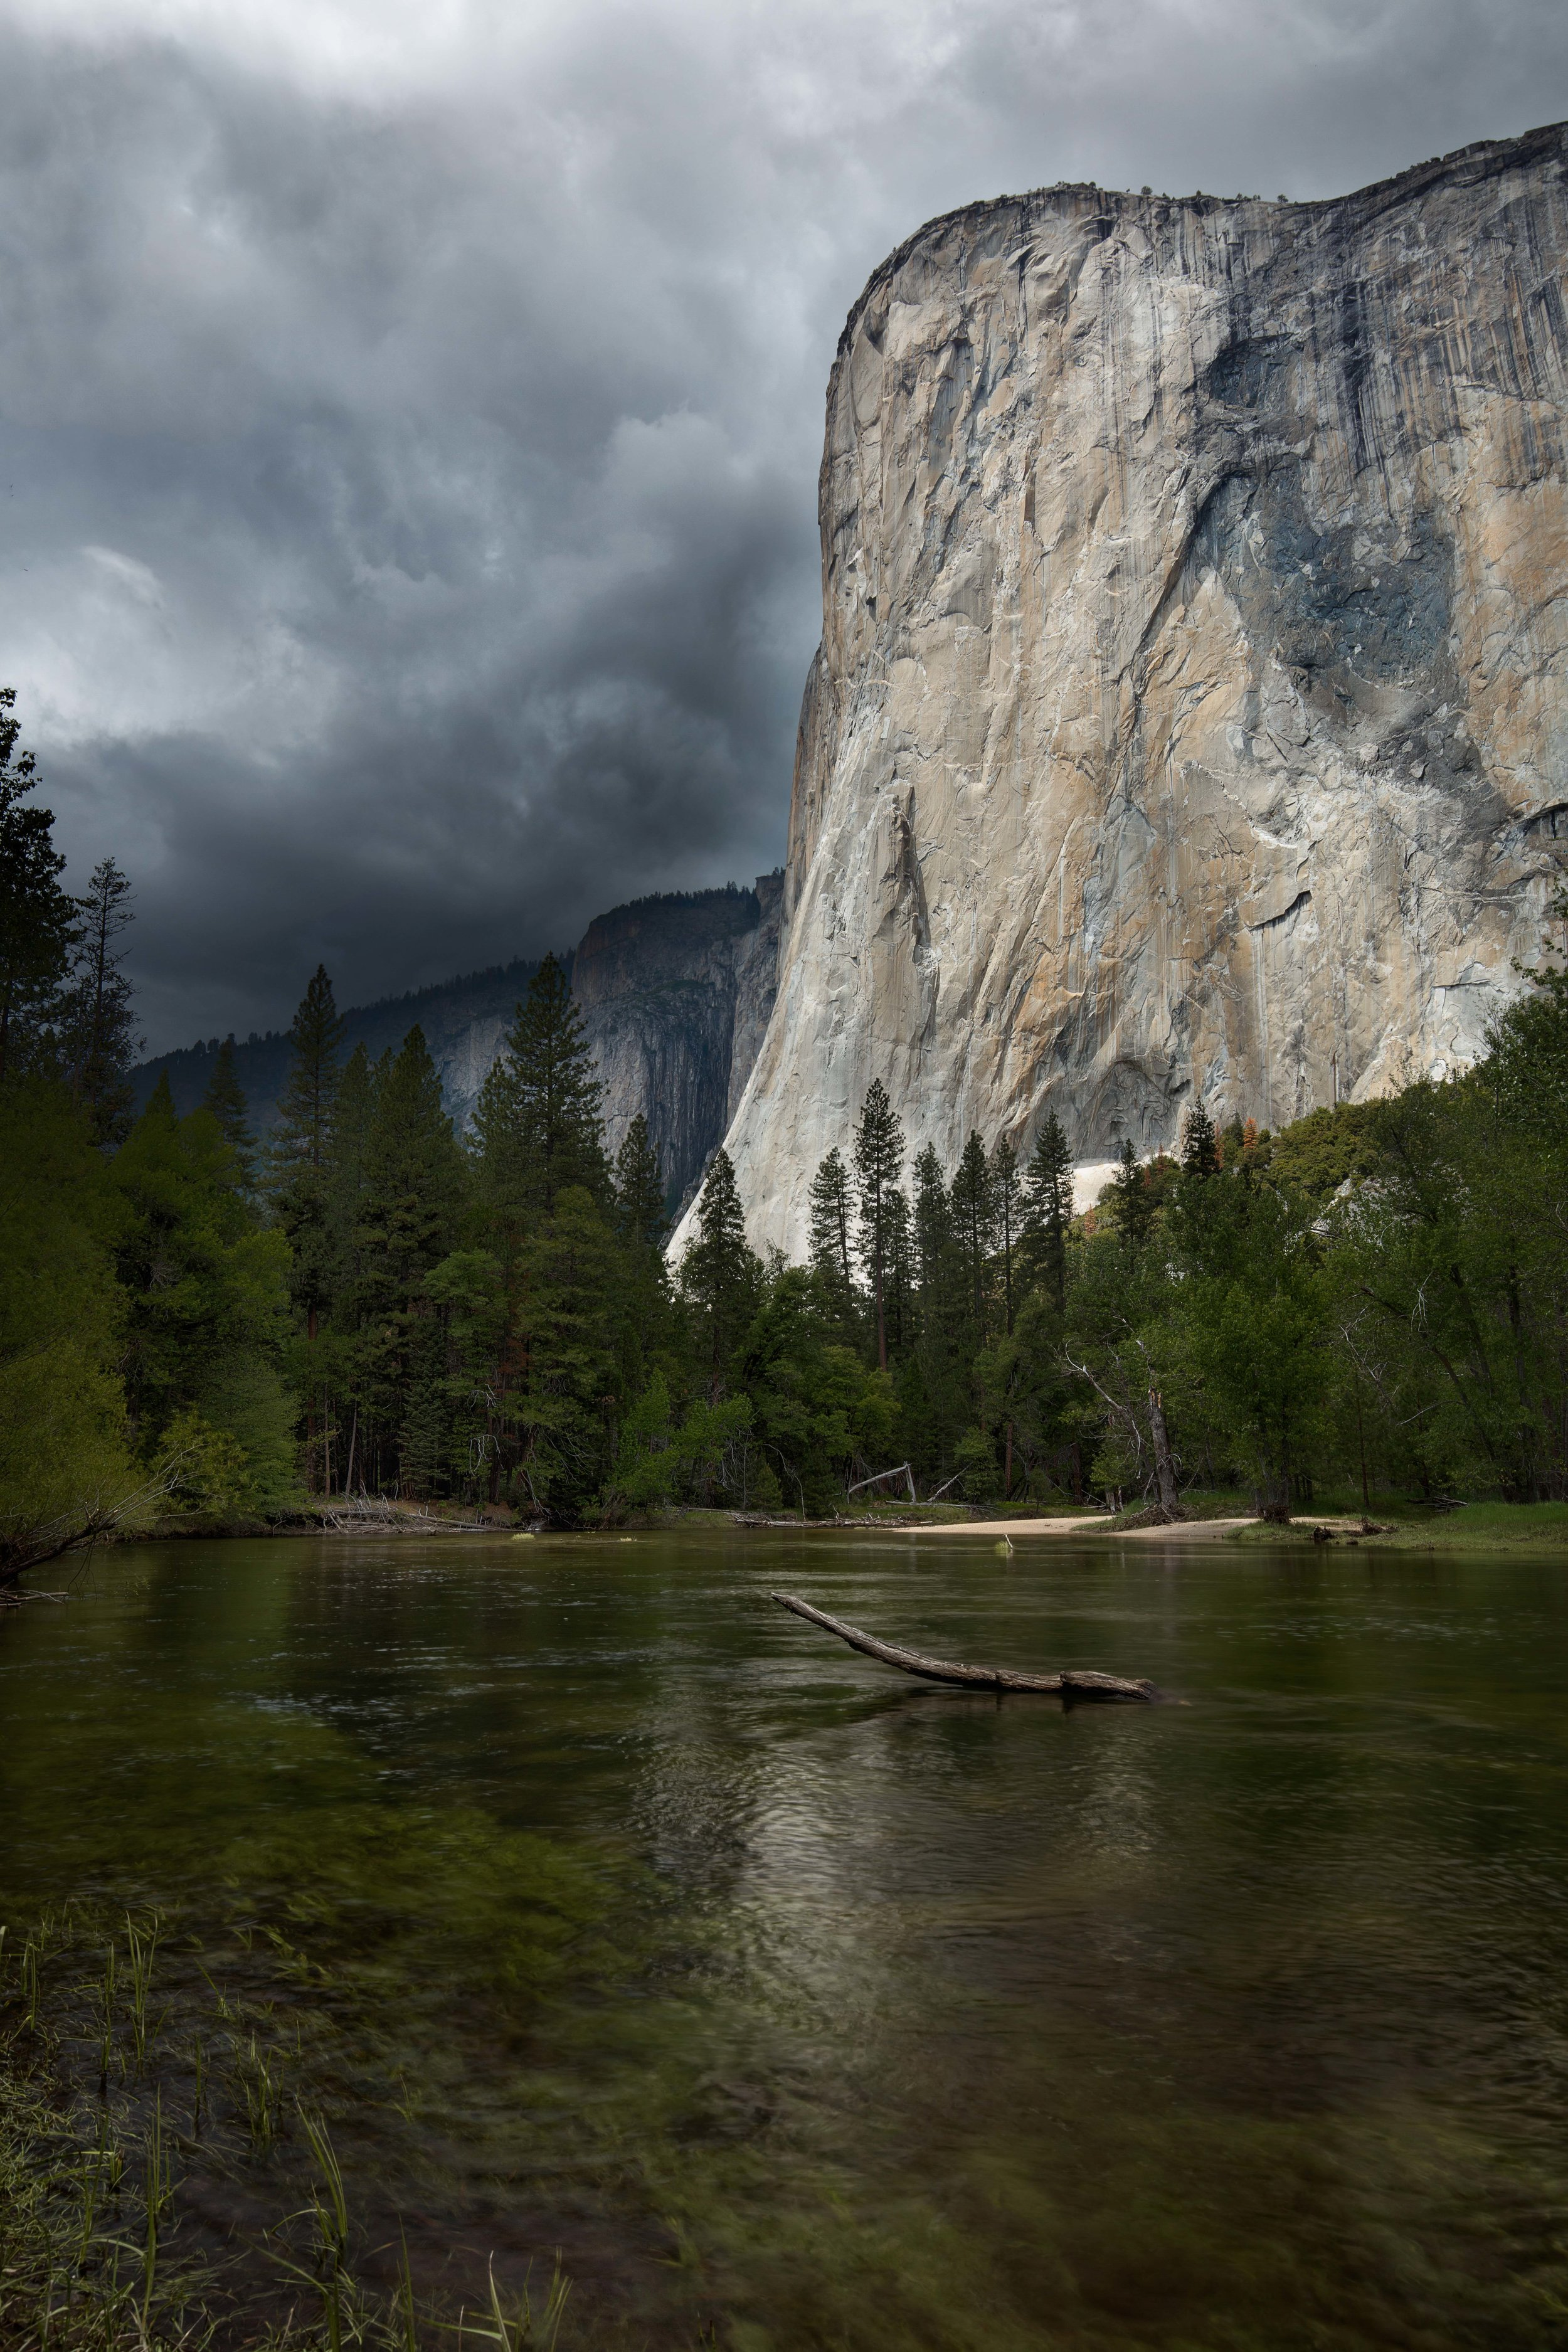 Yosemite james glacier photography-3.jpg